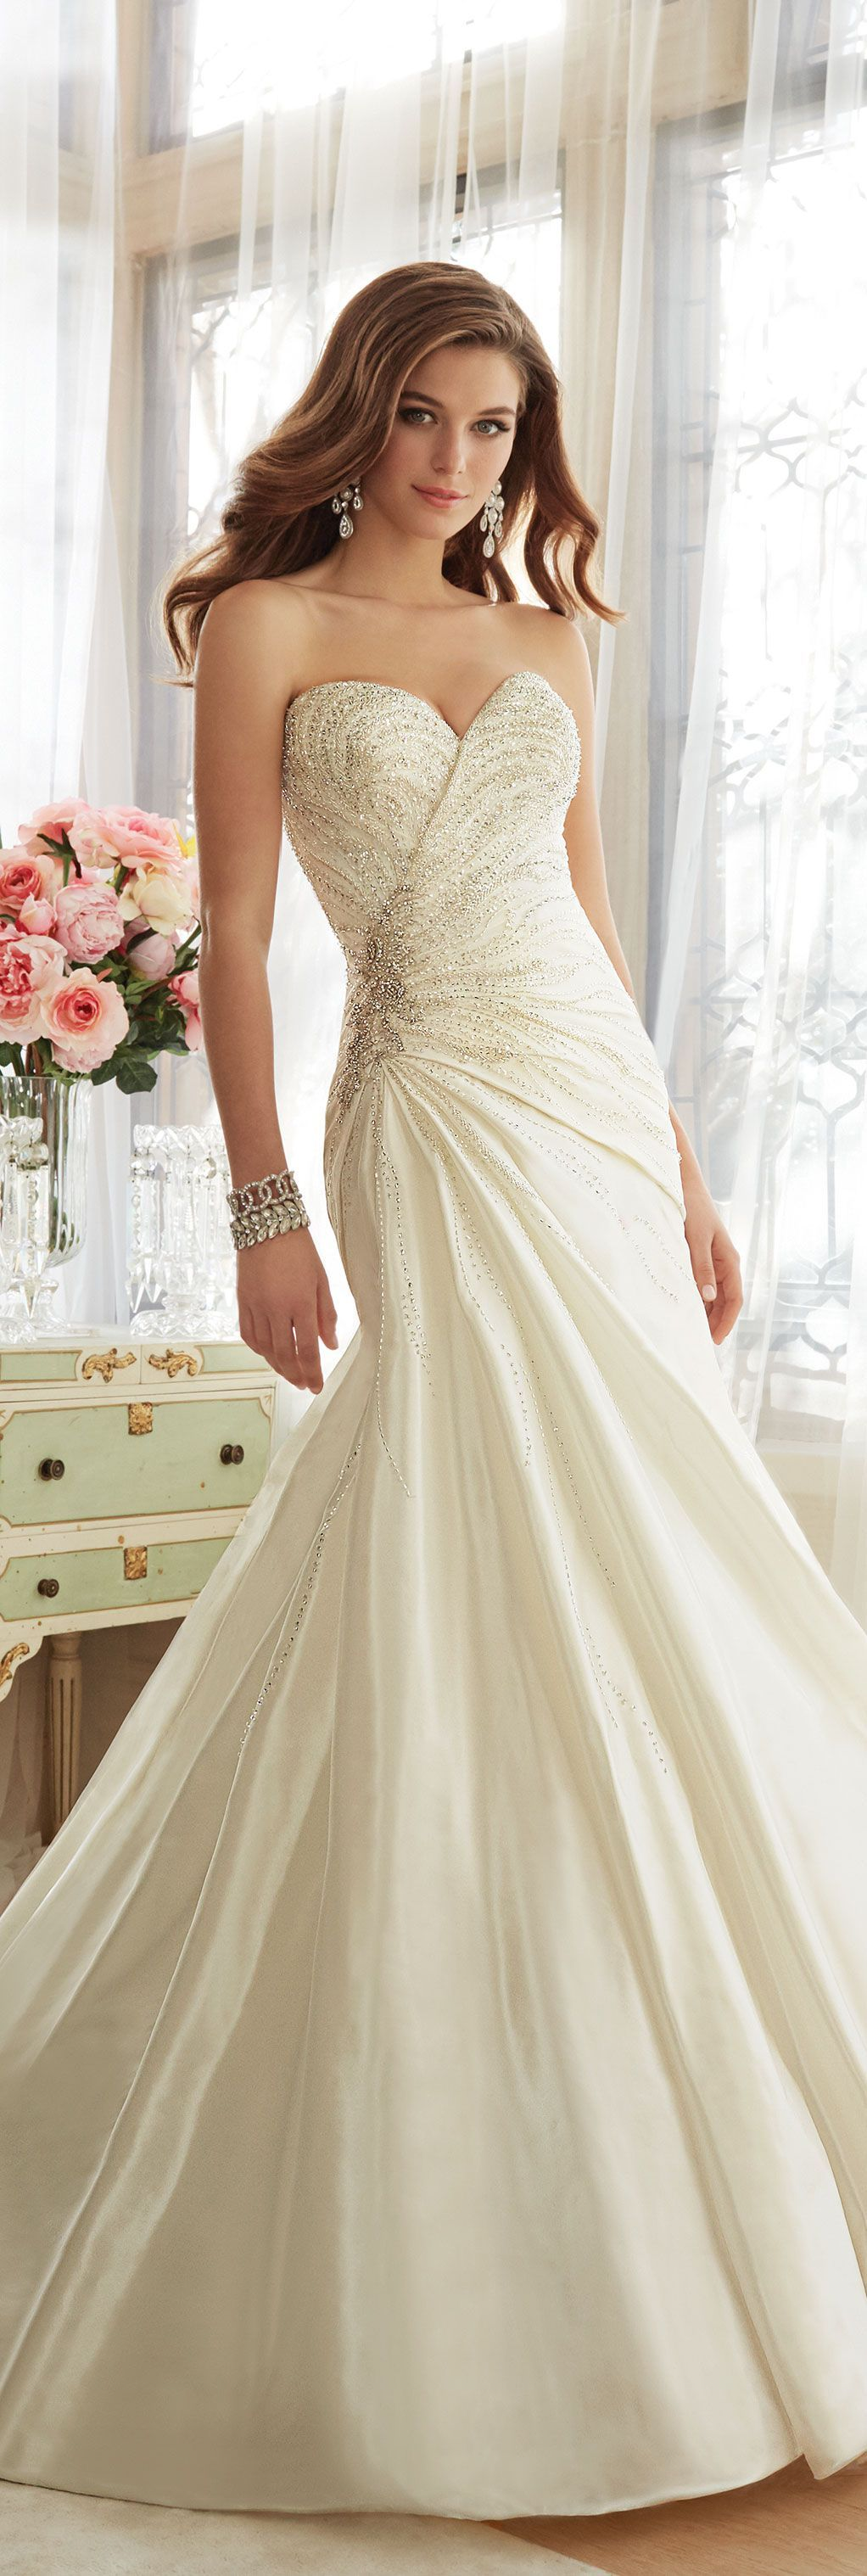 11+ Sophia tolli wedding dresses 2016 info